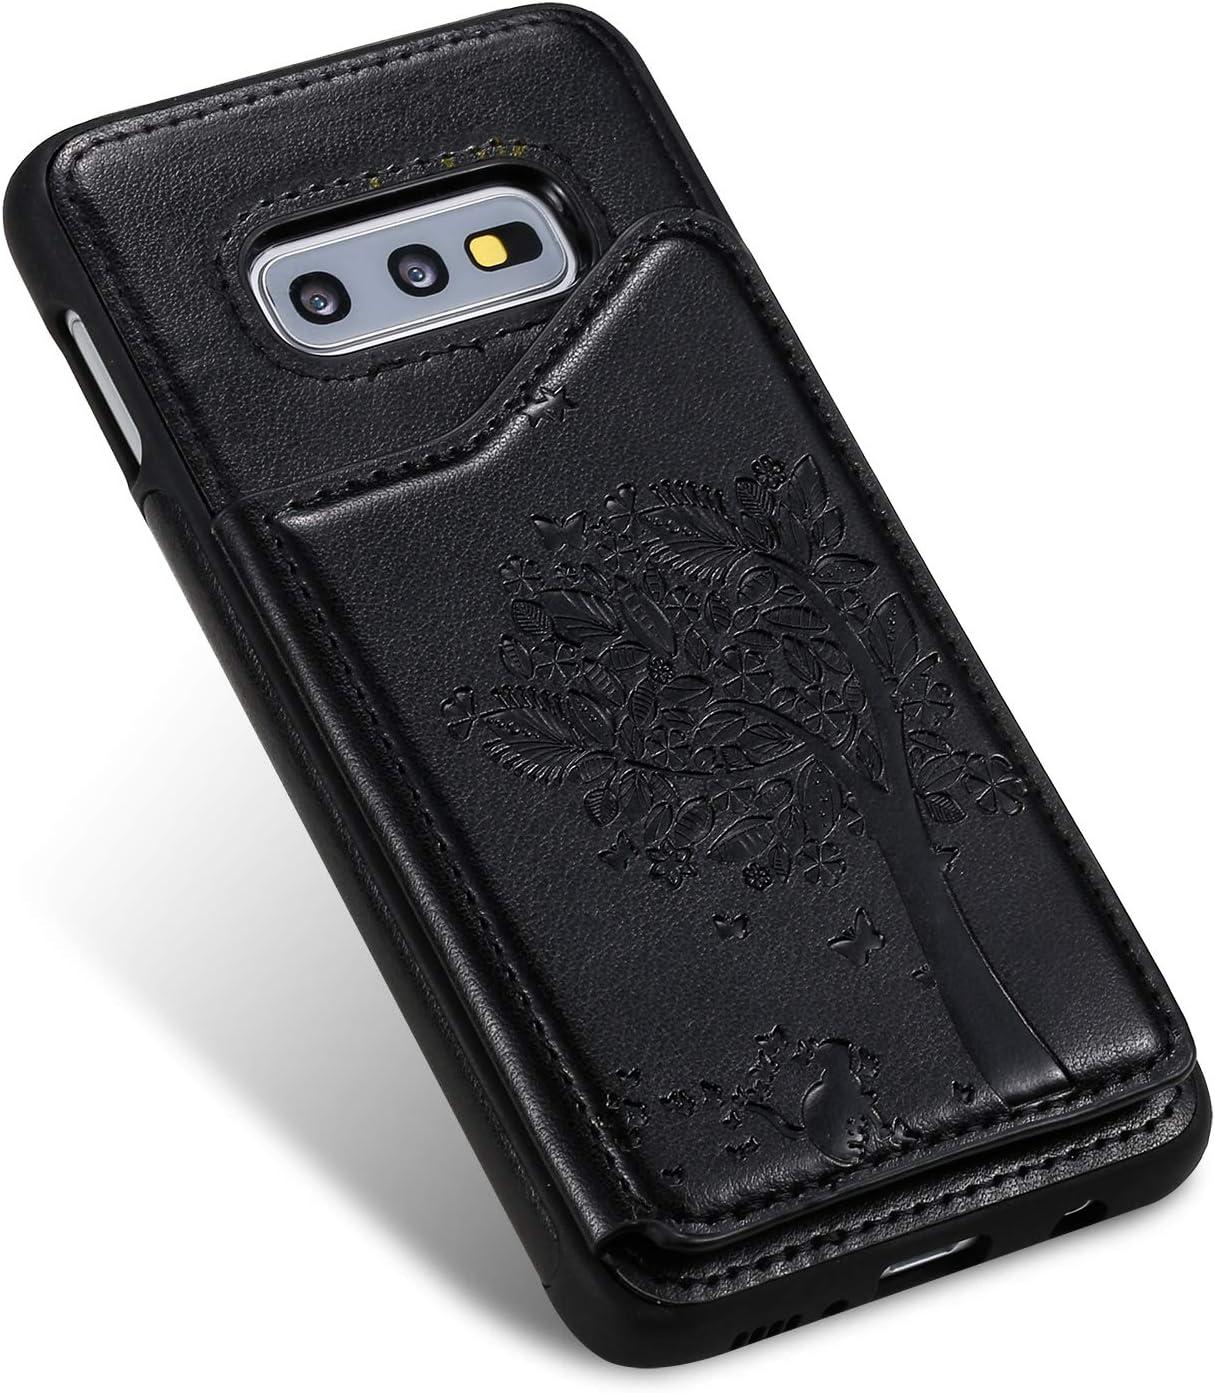 TOKTU120174 Bleu Premium TPU Souple Cuir Silicone Cover Case Antichoc Anti-D/érapante /Étui Housse avec Motif pour Samsung Galaxy S10e//G970F Tosim Coque Galaxy S10e